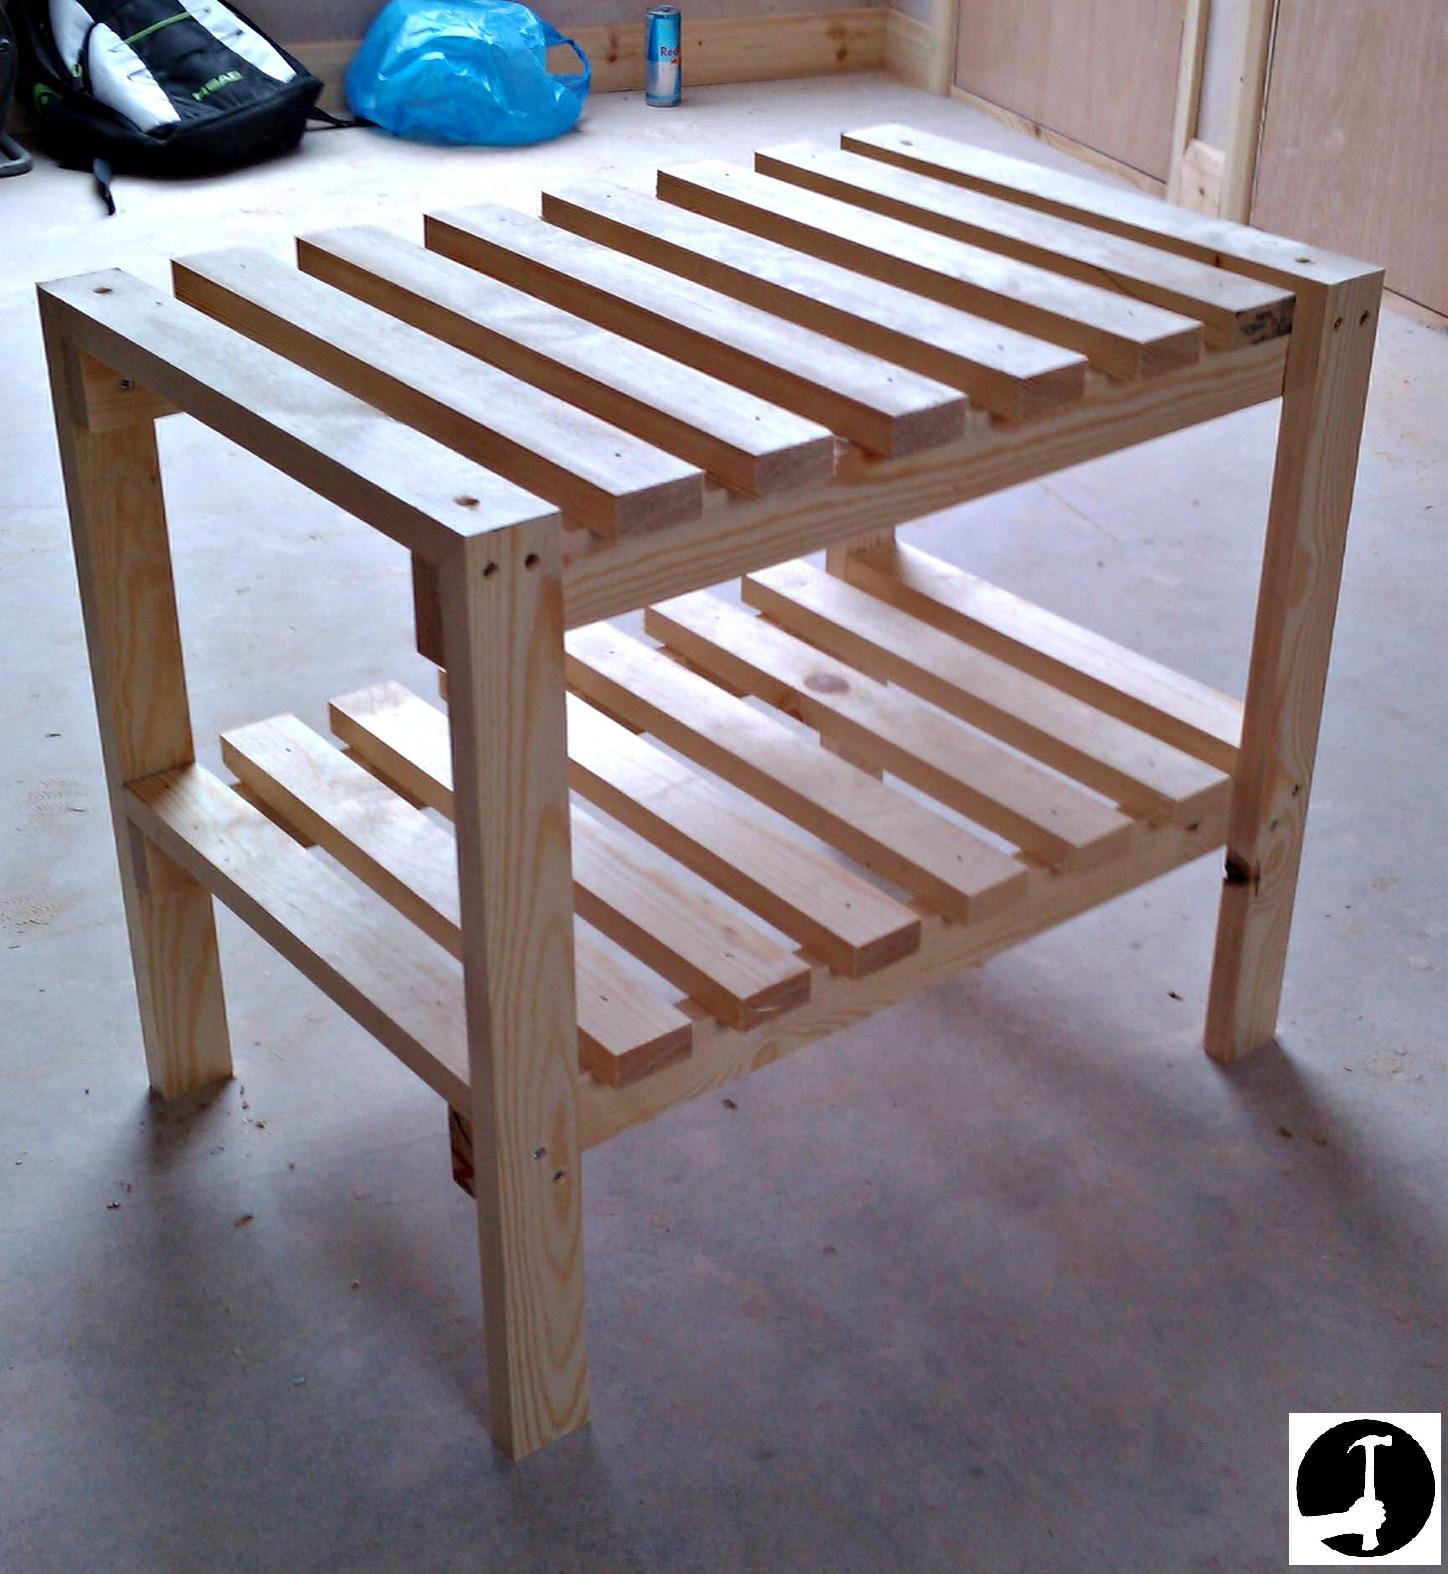 Slatted shelf rack for a cupboard